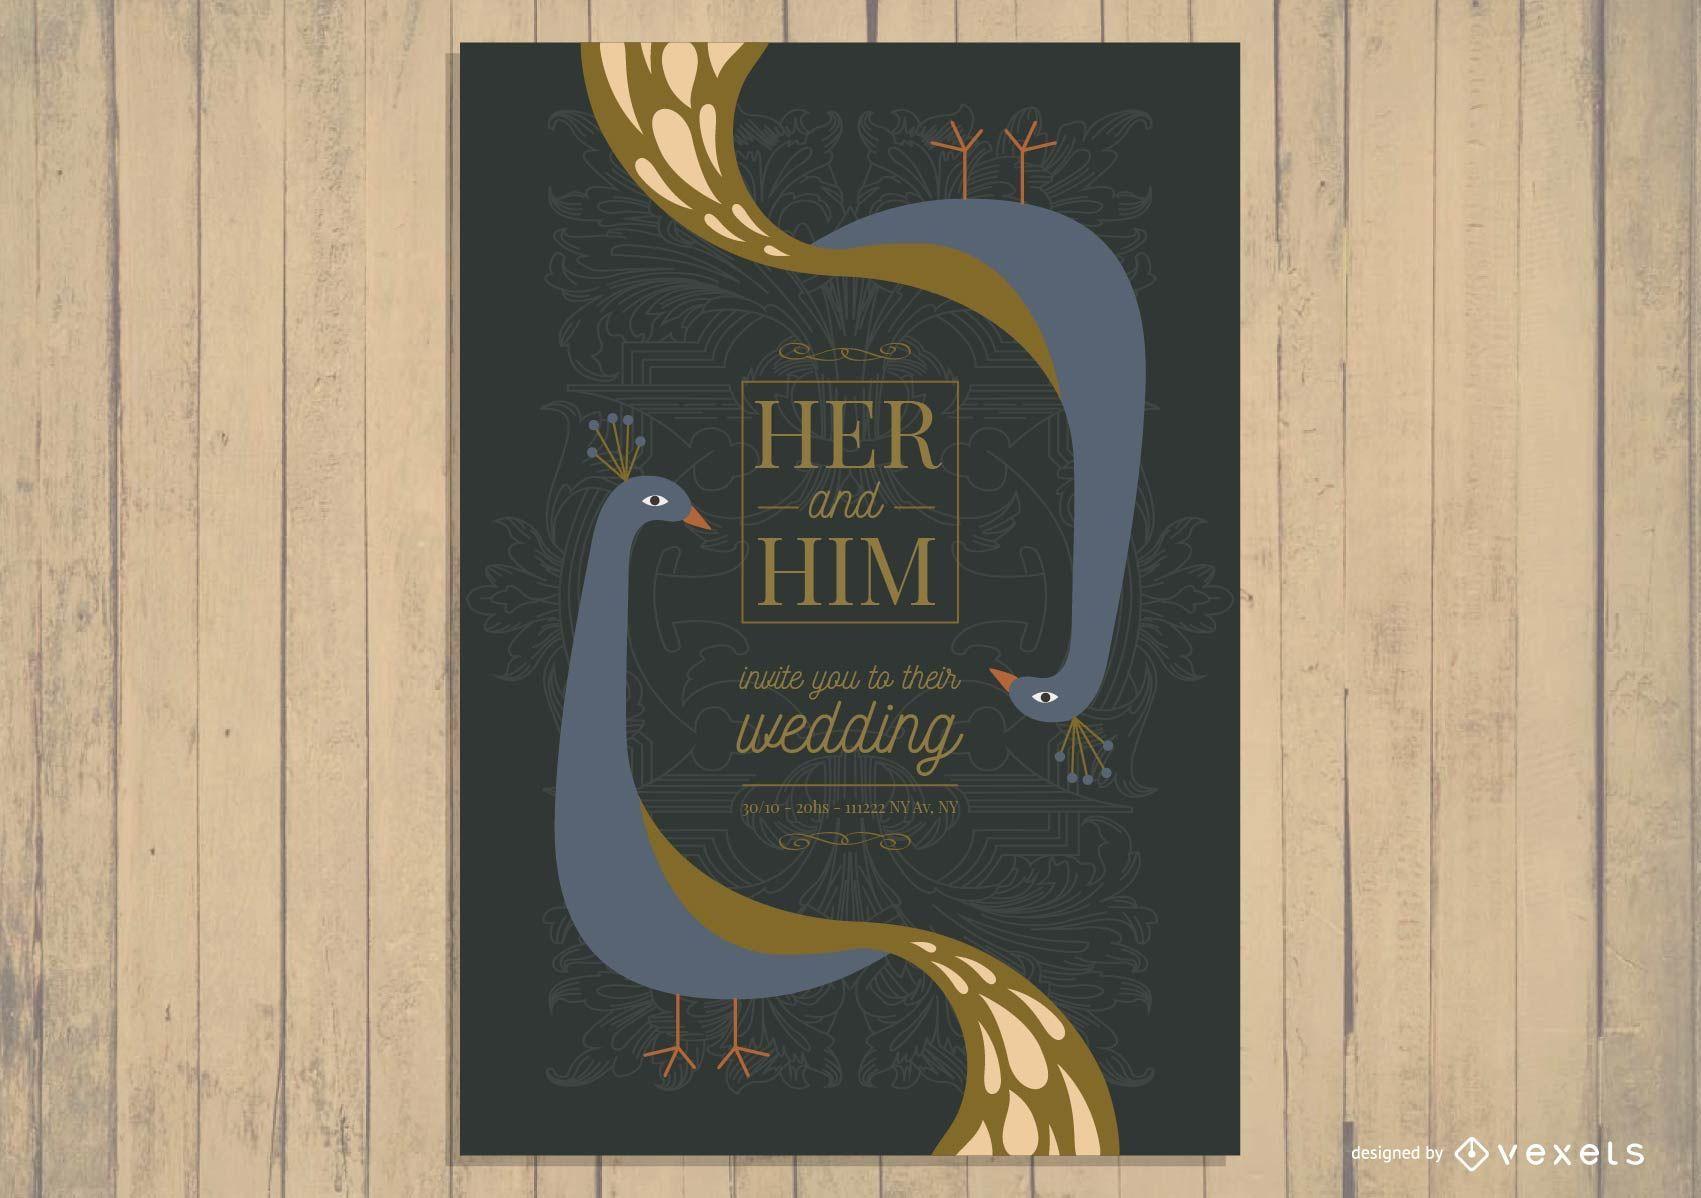 Diseño de invitación de boda asiática